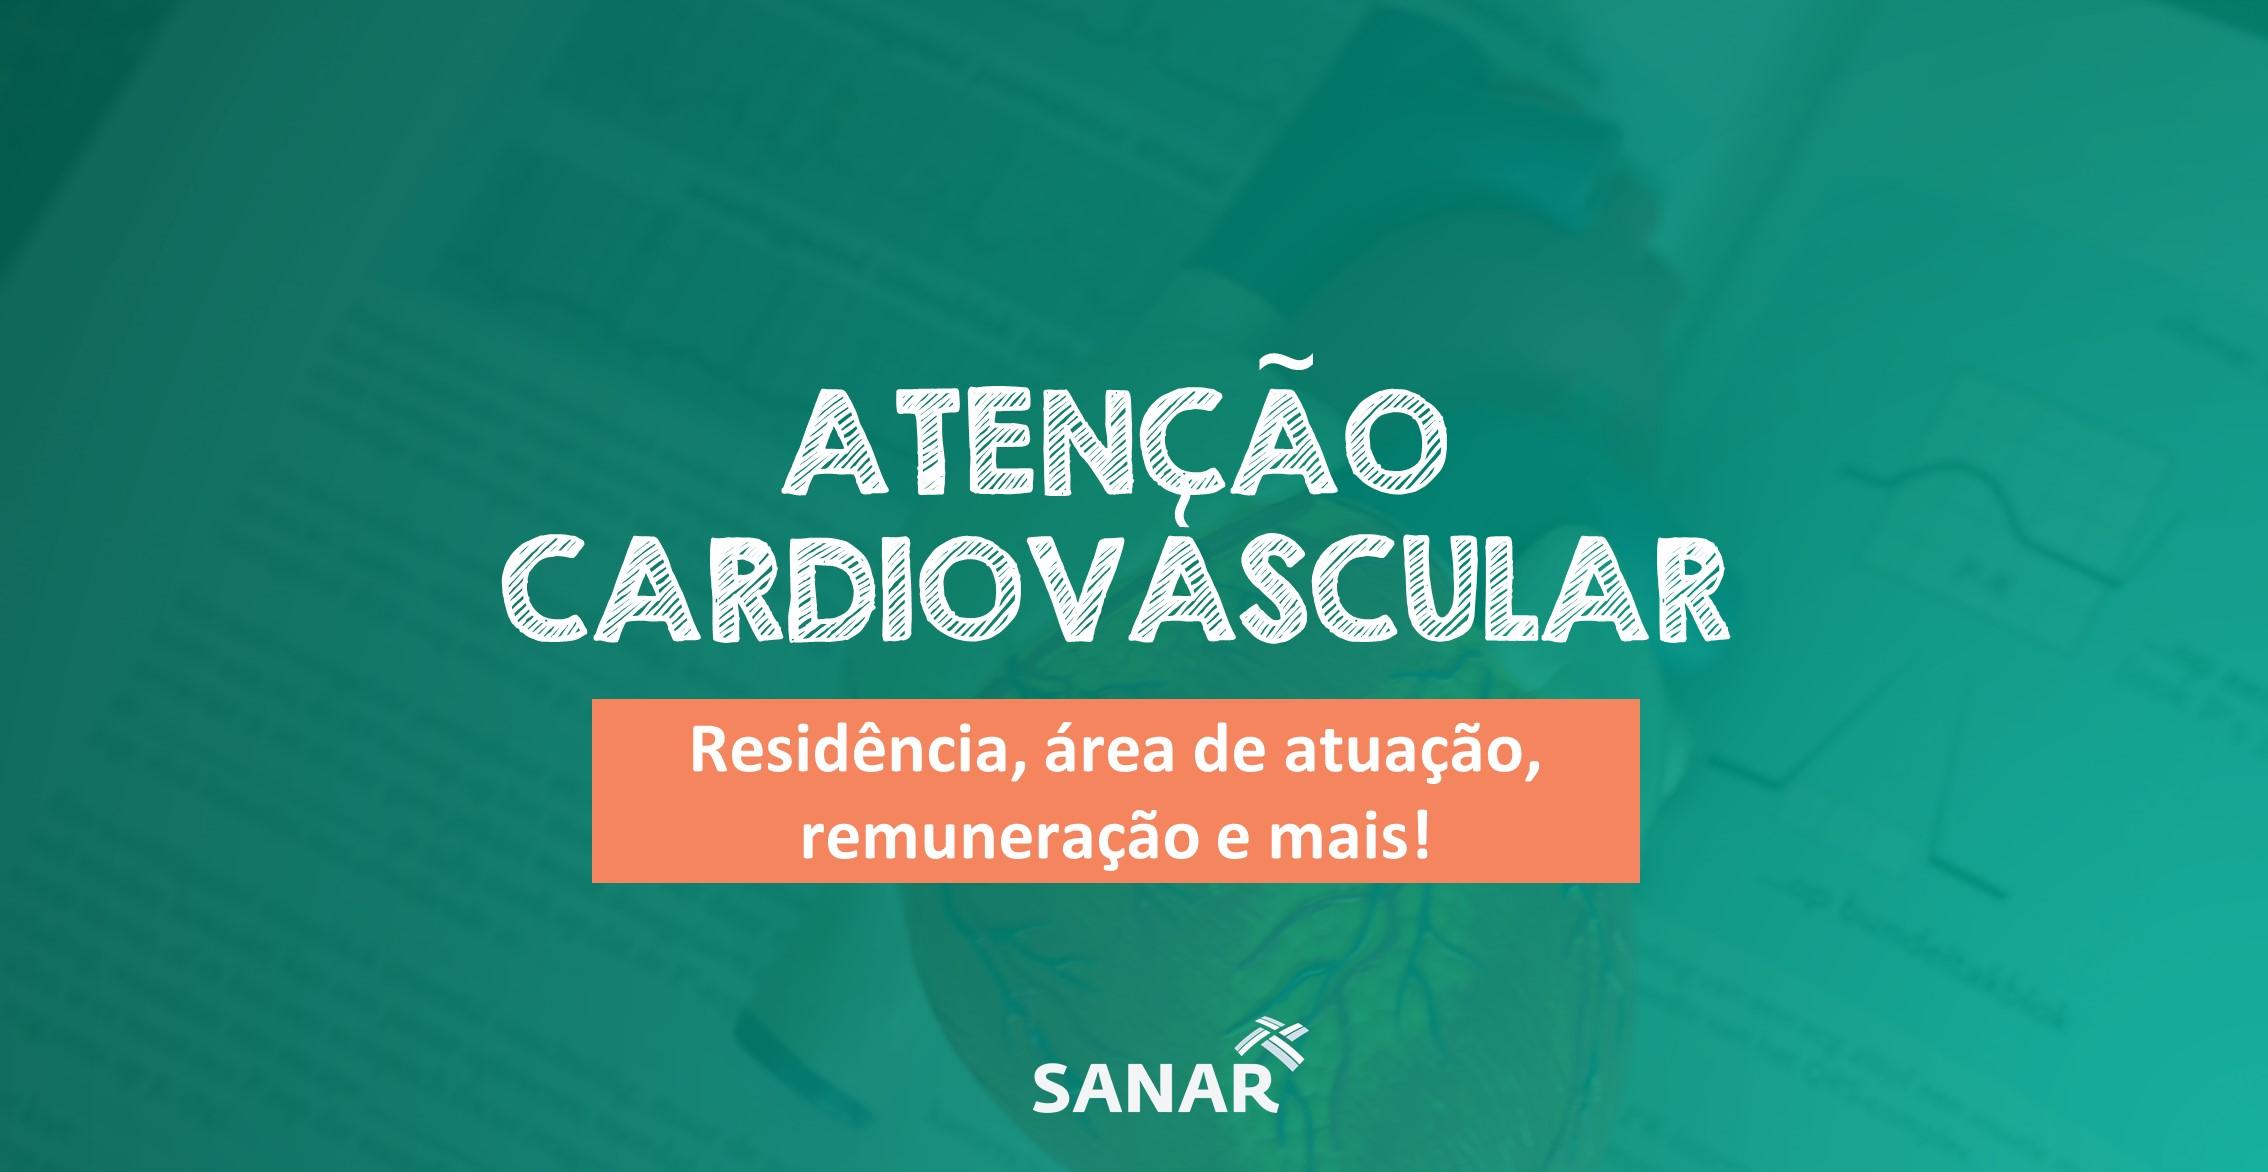 atencao-cardiovascular-robina-weermeijer-unsplash.jpg (212 KB)